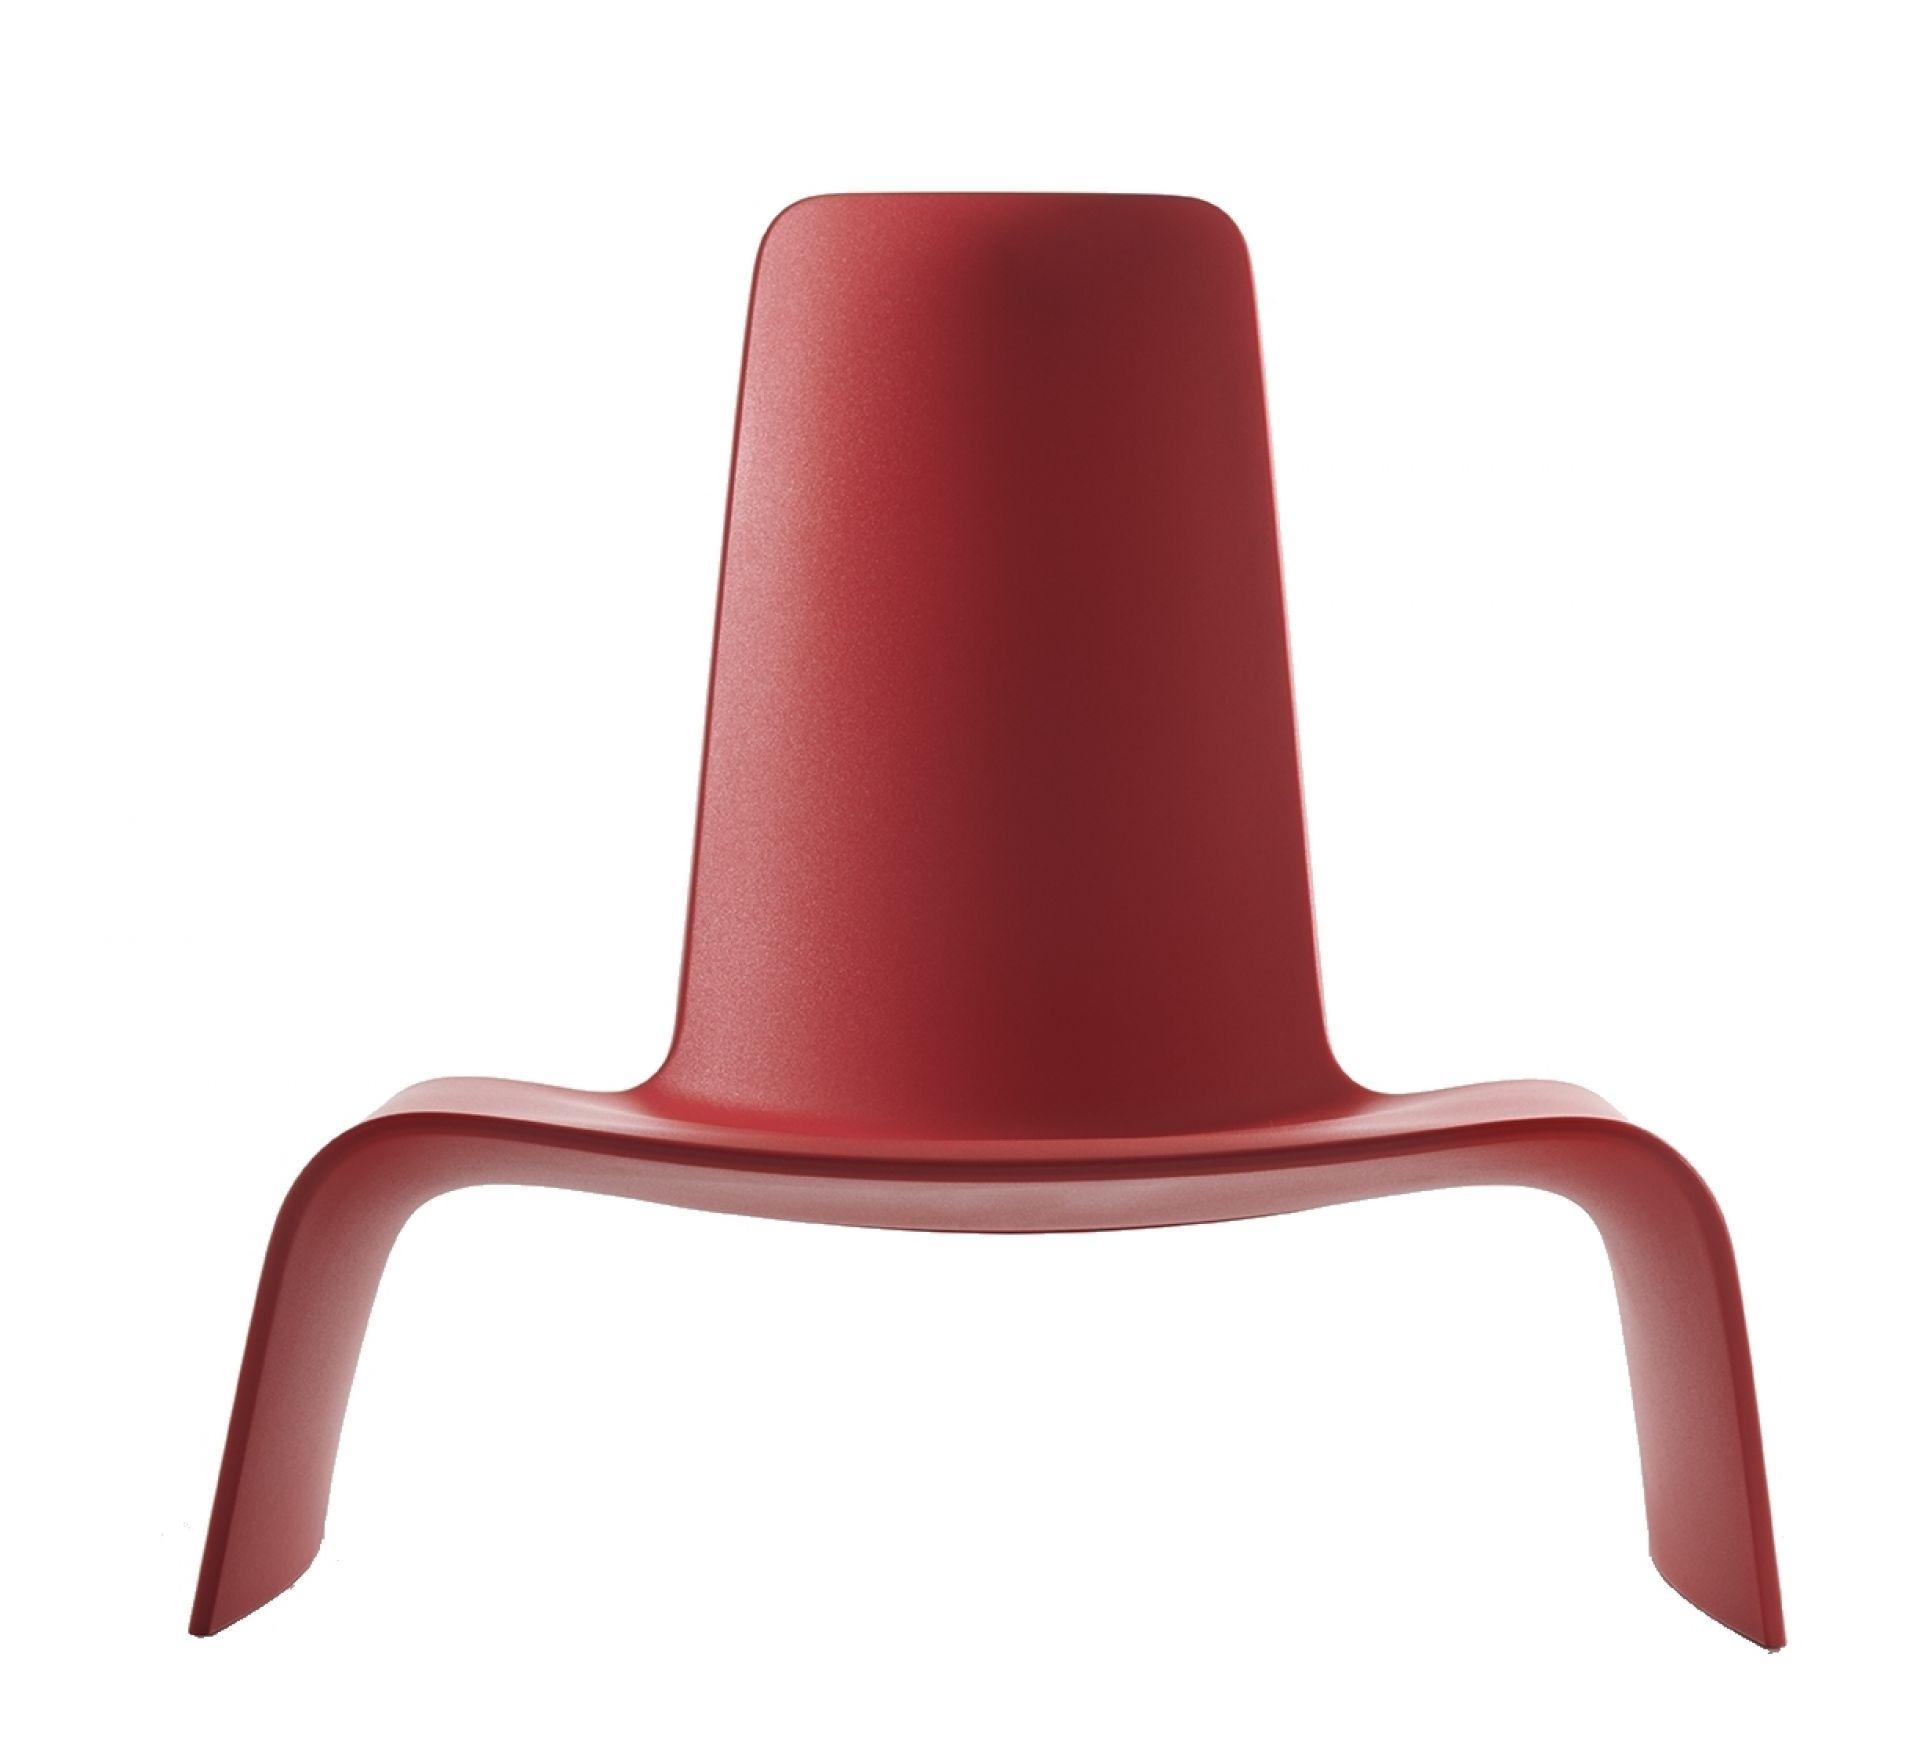 Land Lounge Chair Sessel Verkehrsrot Plank